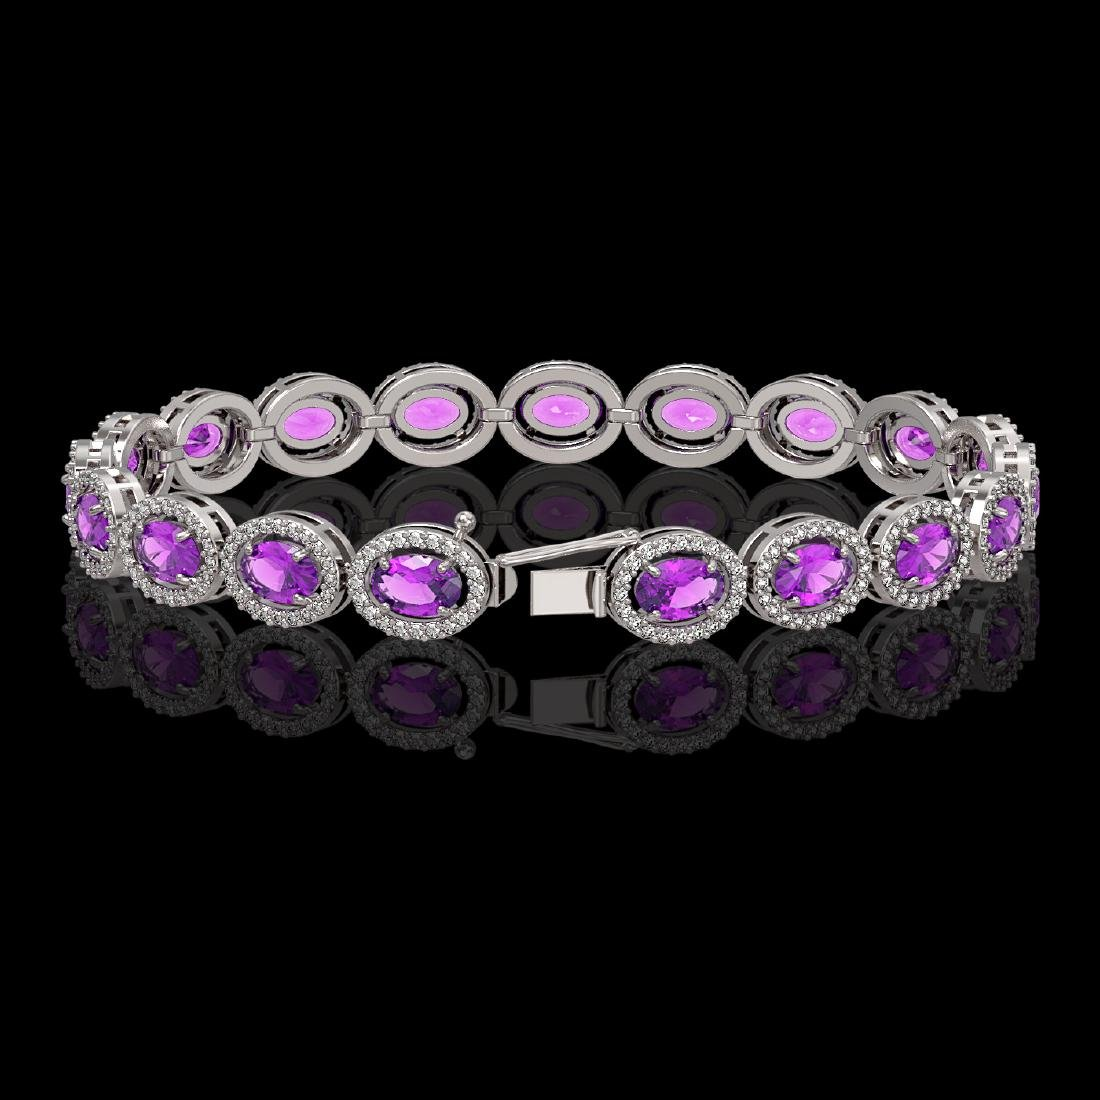 13.11 CTW Amethyst & Diamond Halo Bracelet 10K White - 2